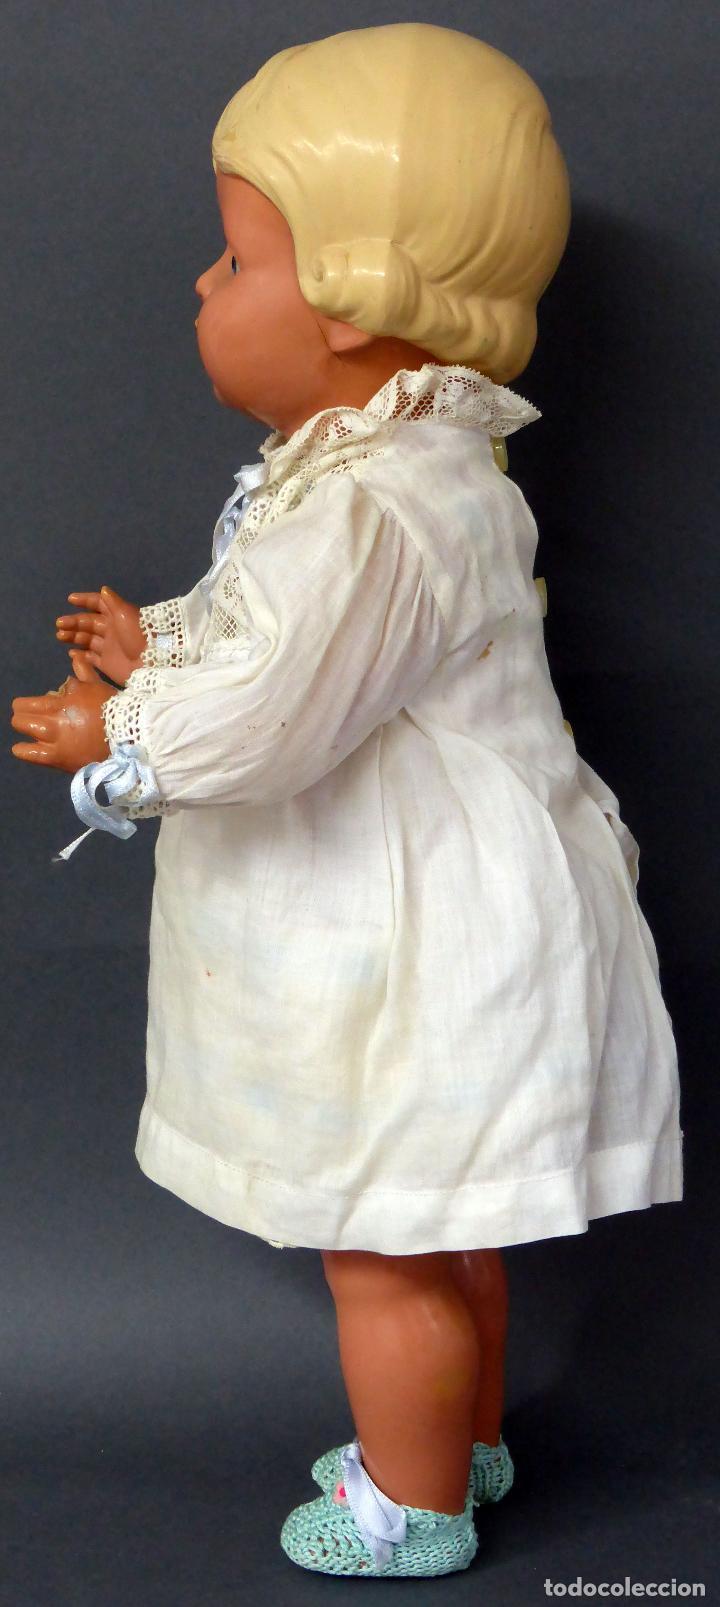 Muñecas Celuloide: Muñeca celuloide La Tortuga 45 Schildkrot marca espalda ropa original años 30 45 cm alto - Foto 4 - 88976408